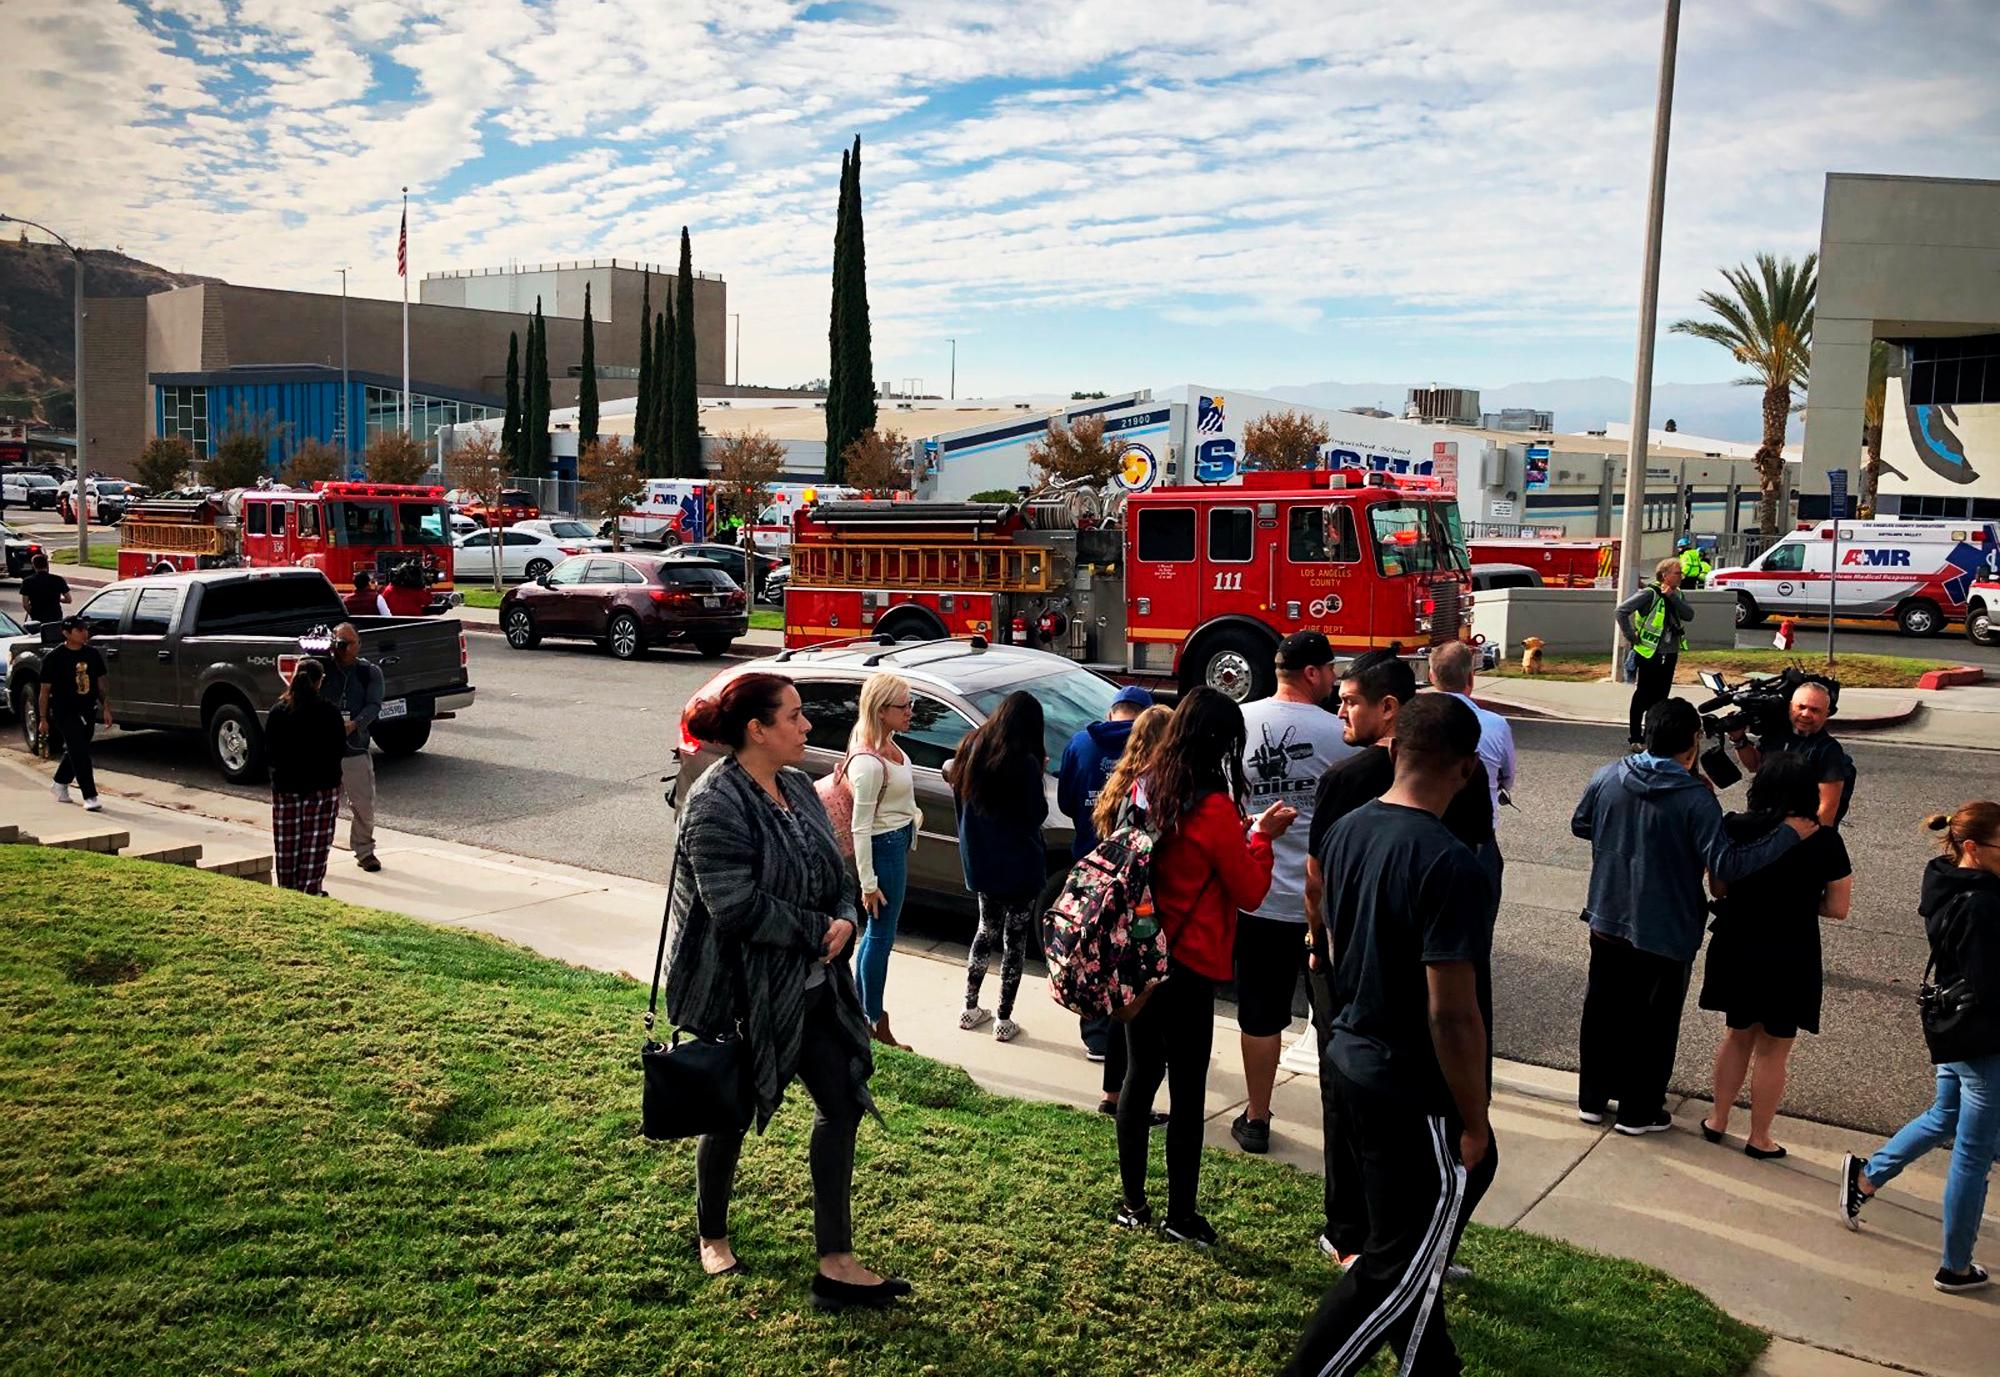 Saugus High School shooting in Santa Clarita, California: what we know